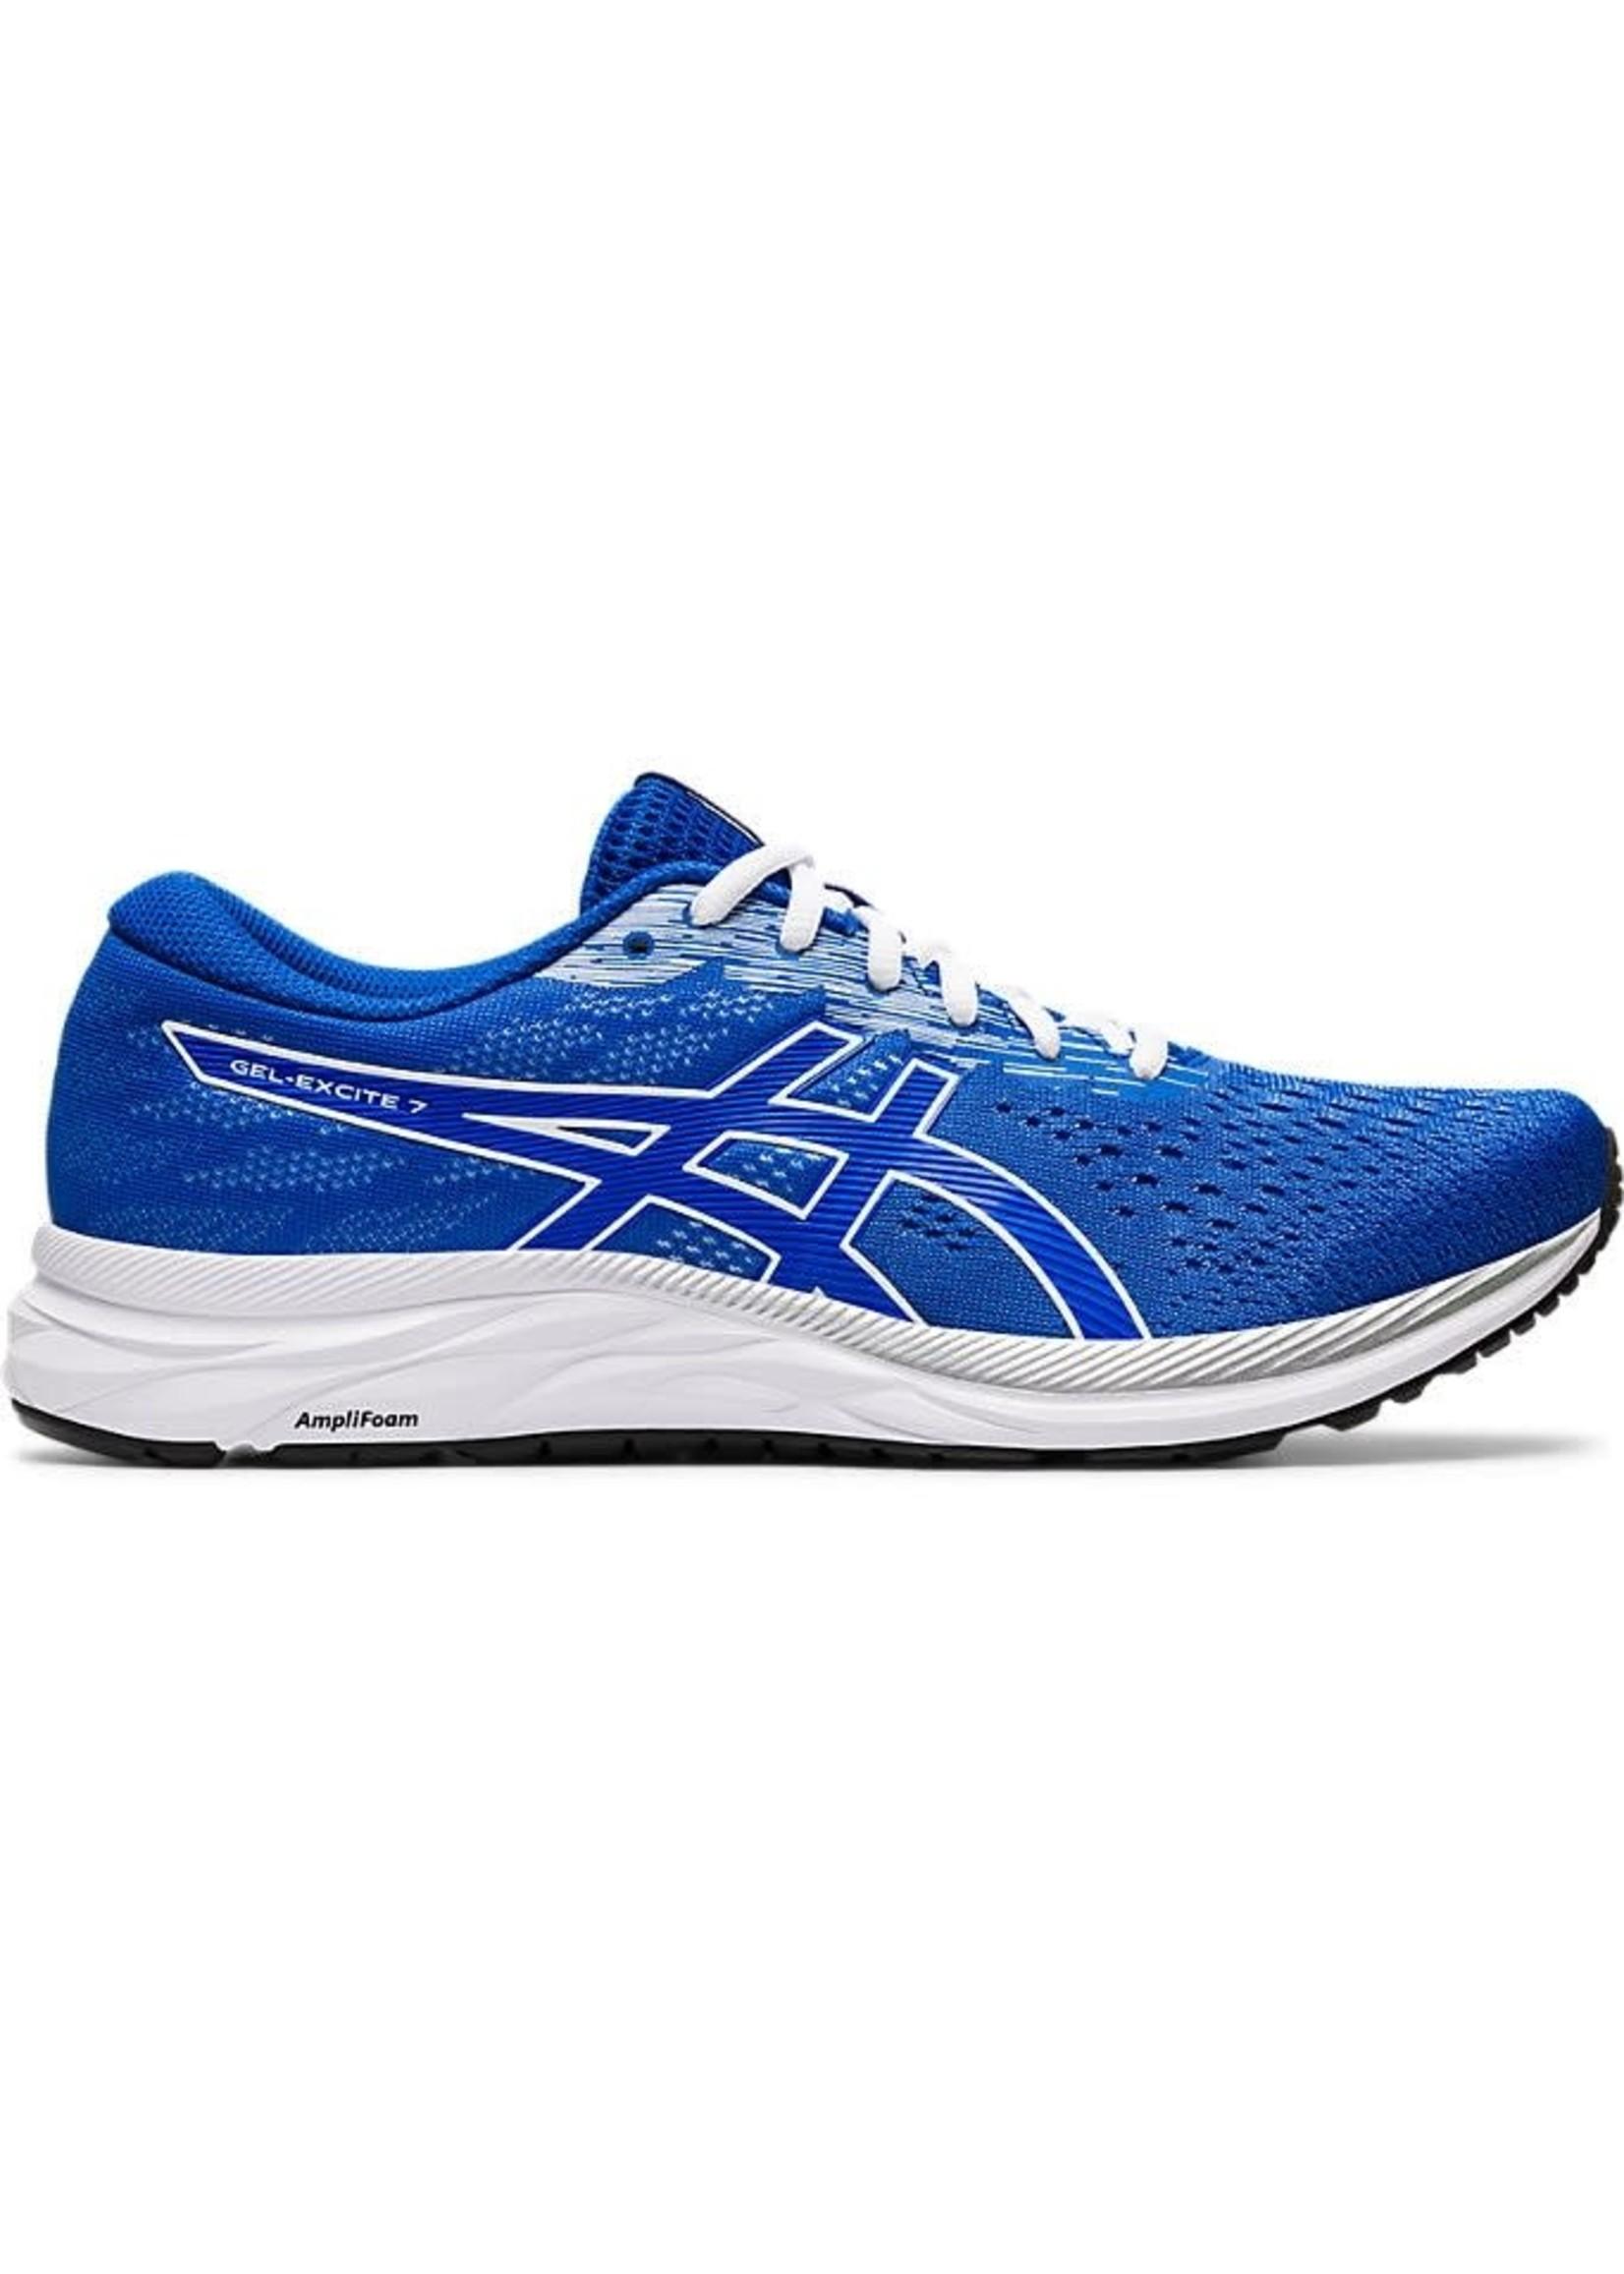 Asics Asics Gel-Excite 7 Mens Running Shoes, Tuna Blue/White